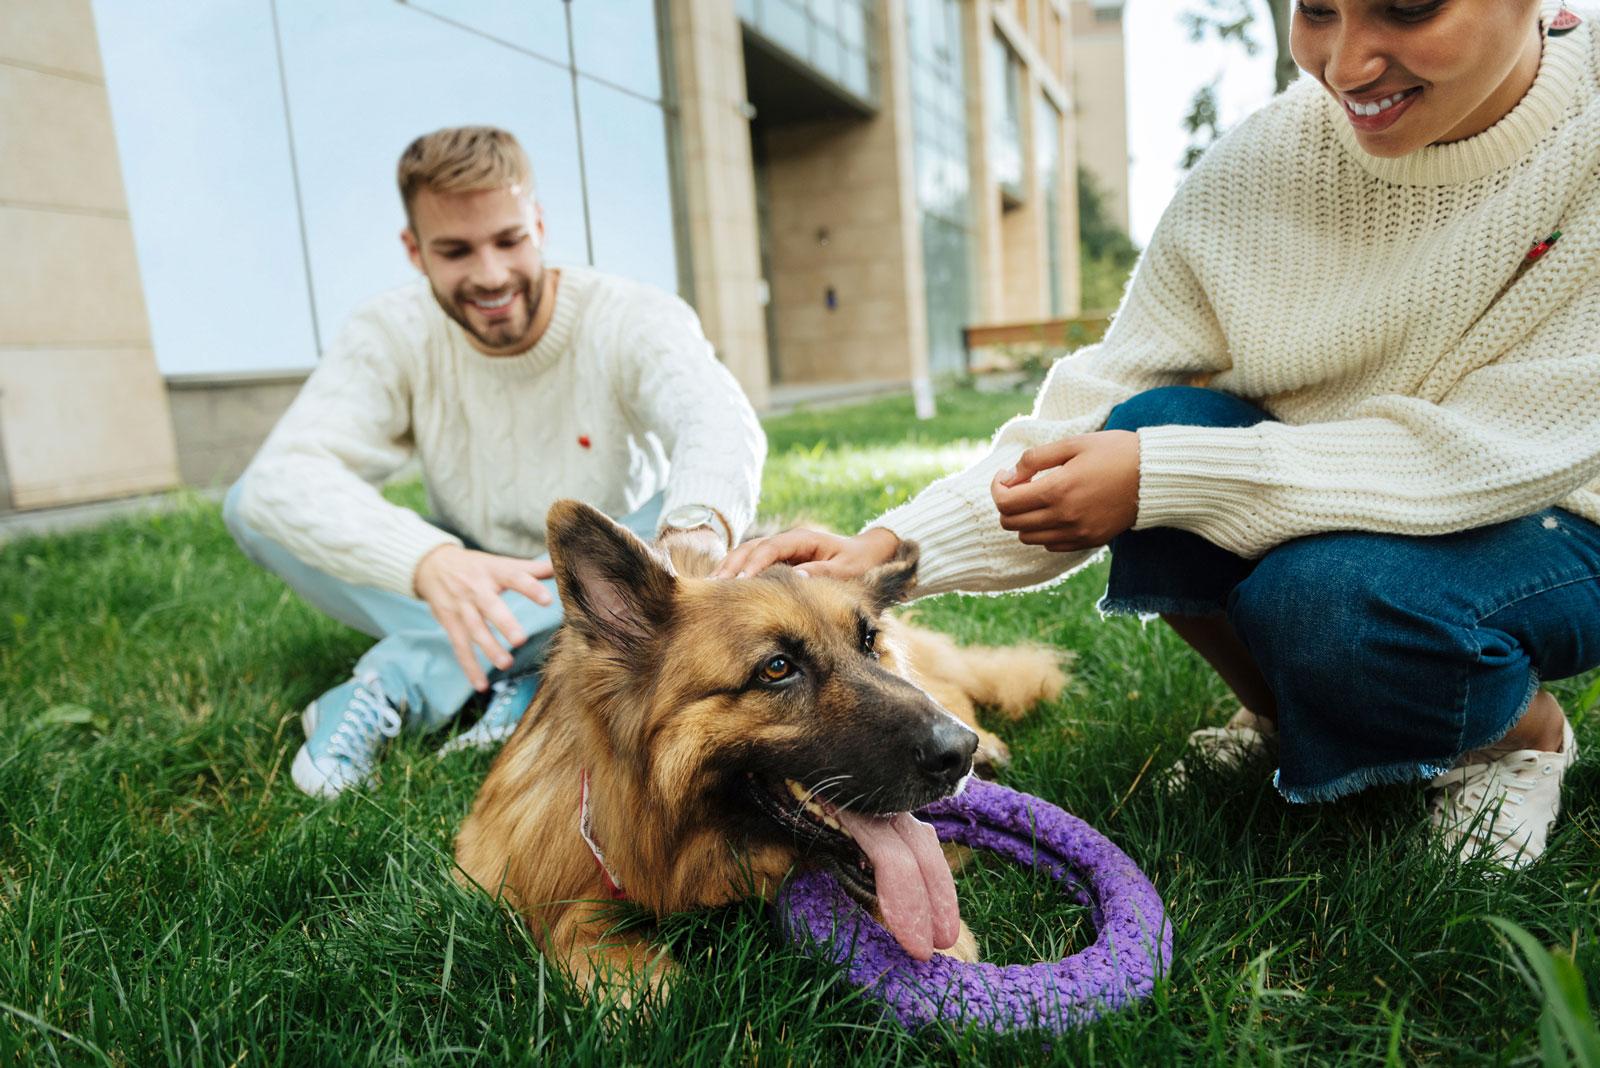 Gute Gesprächsbasis: Hunde fördern soziale Kontakte.